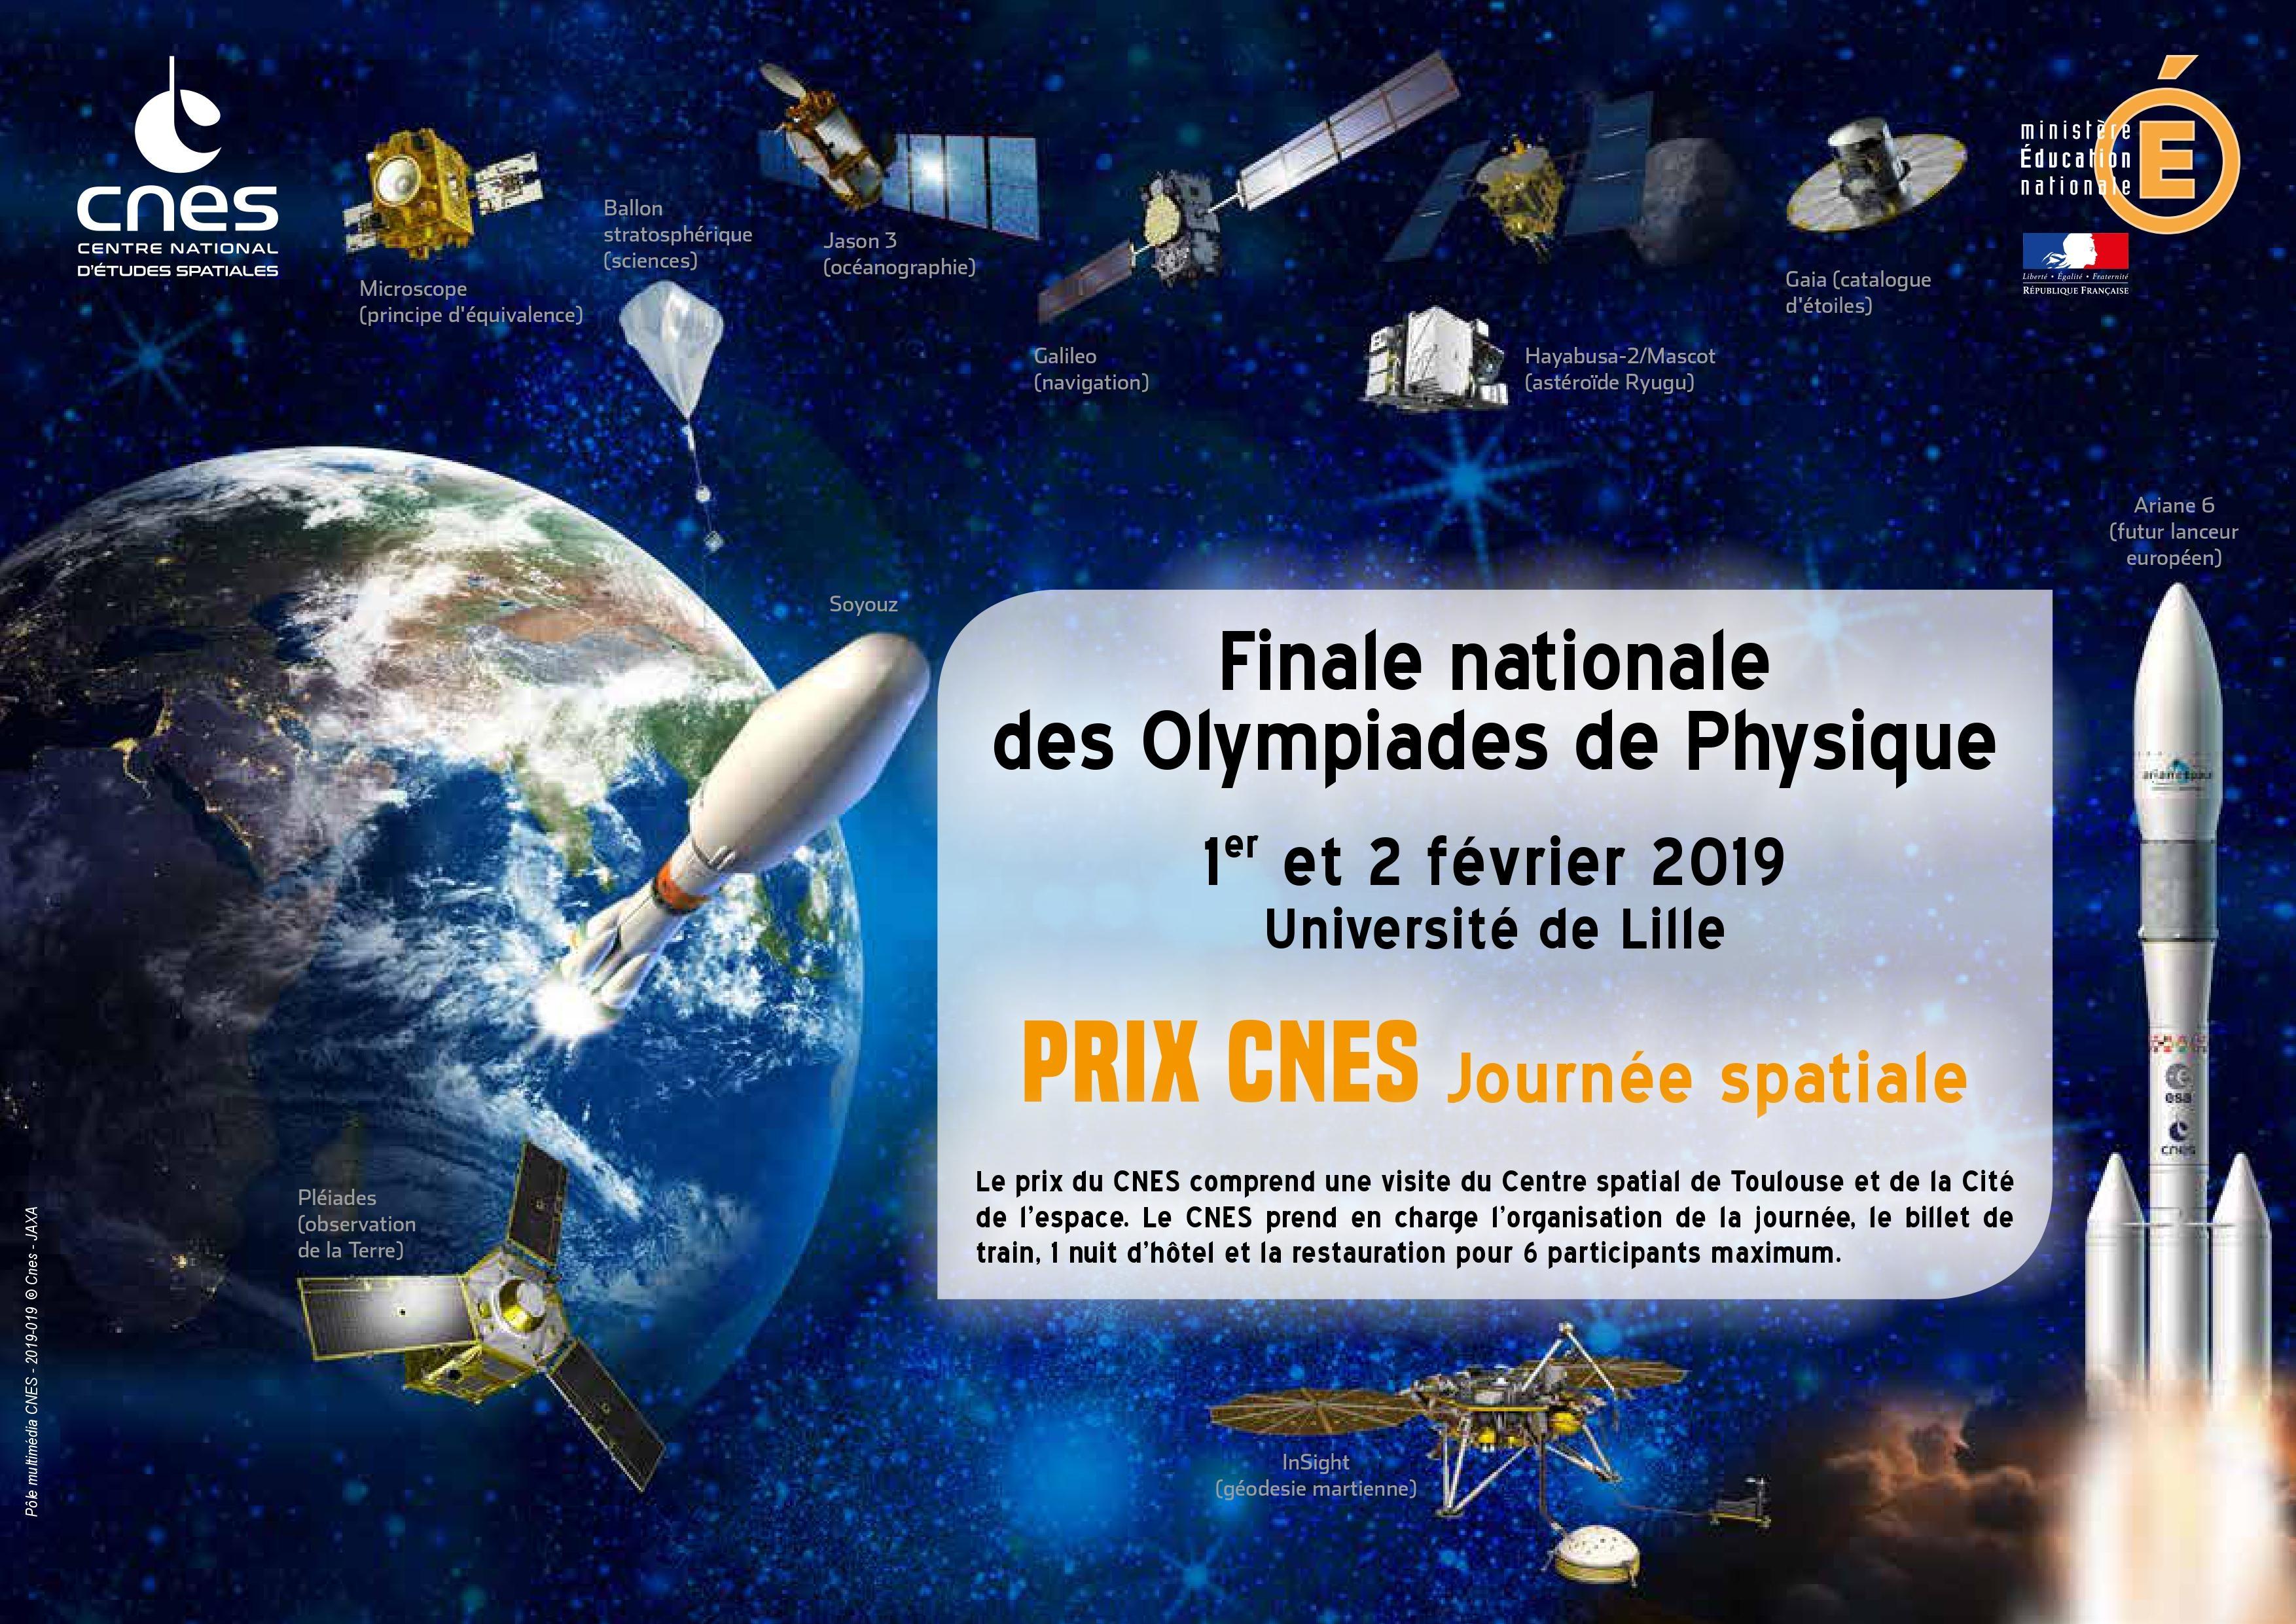 prix_cnes_olympiades_de_physique_2019.jpg